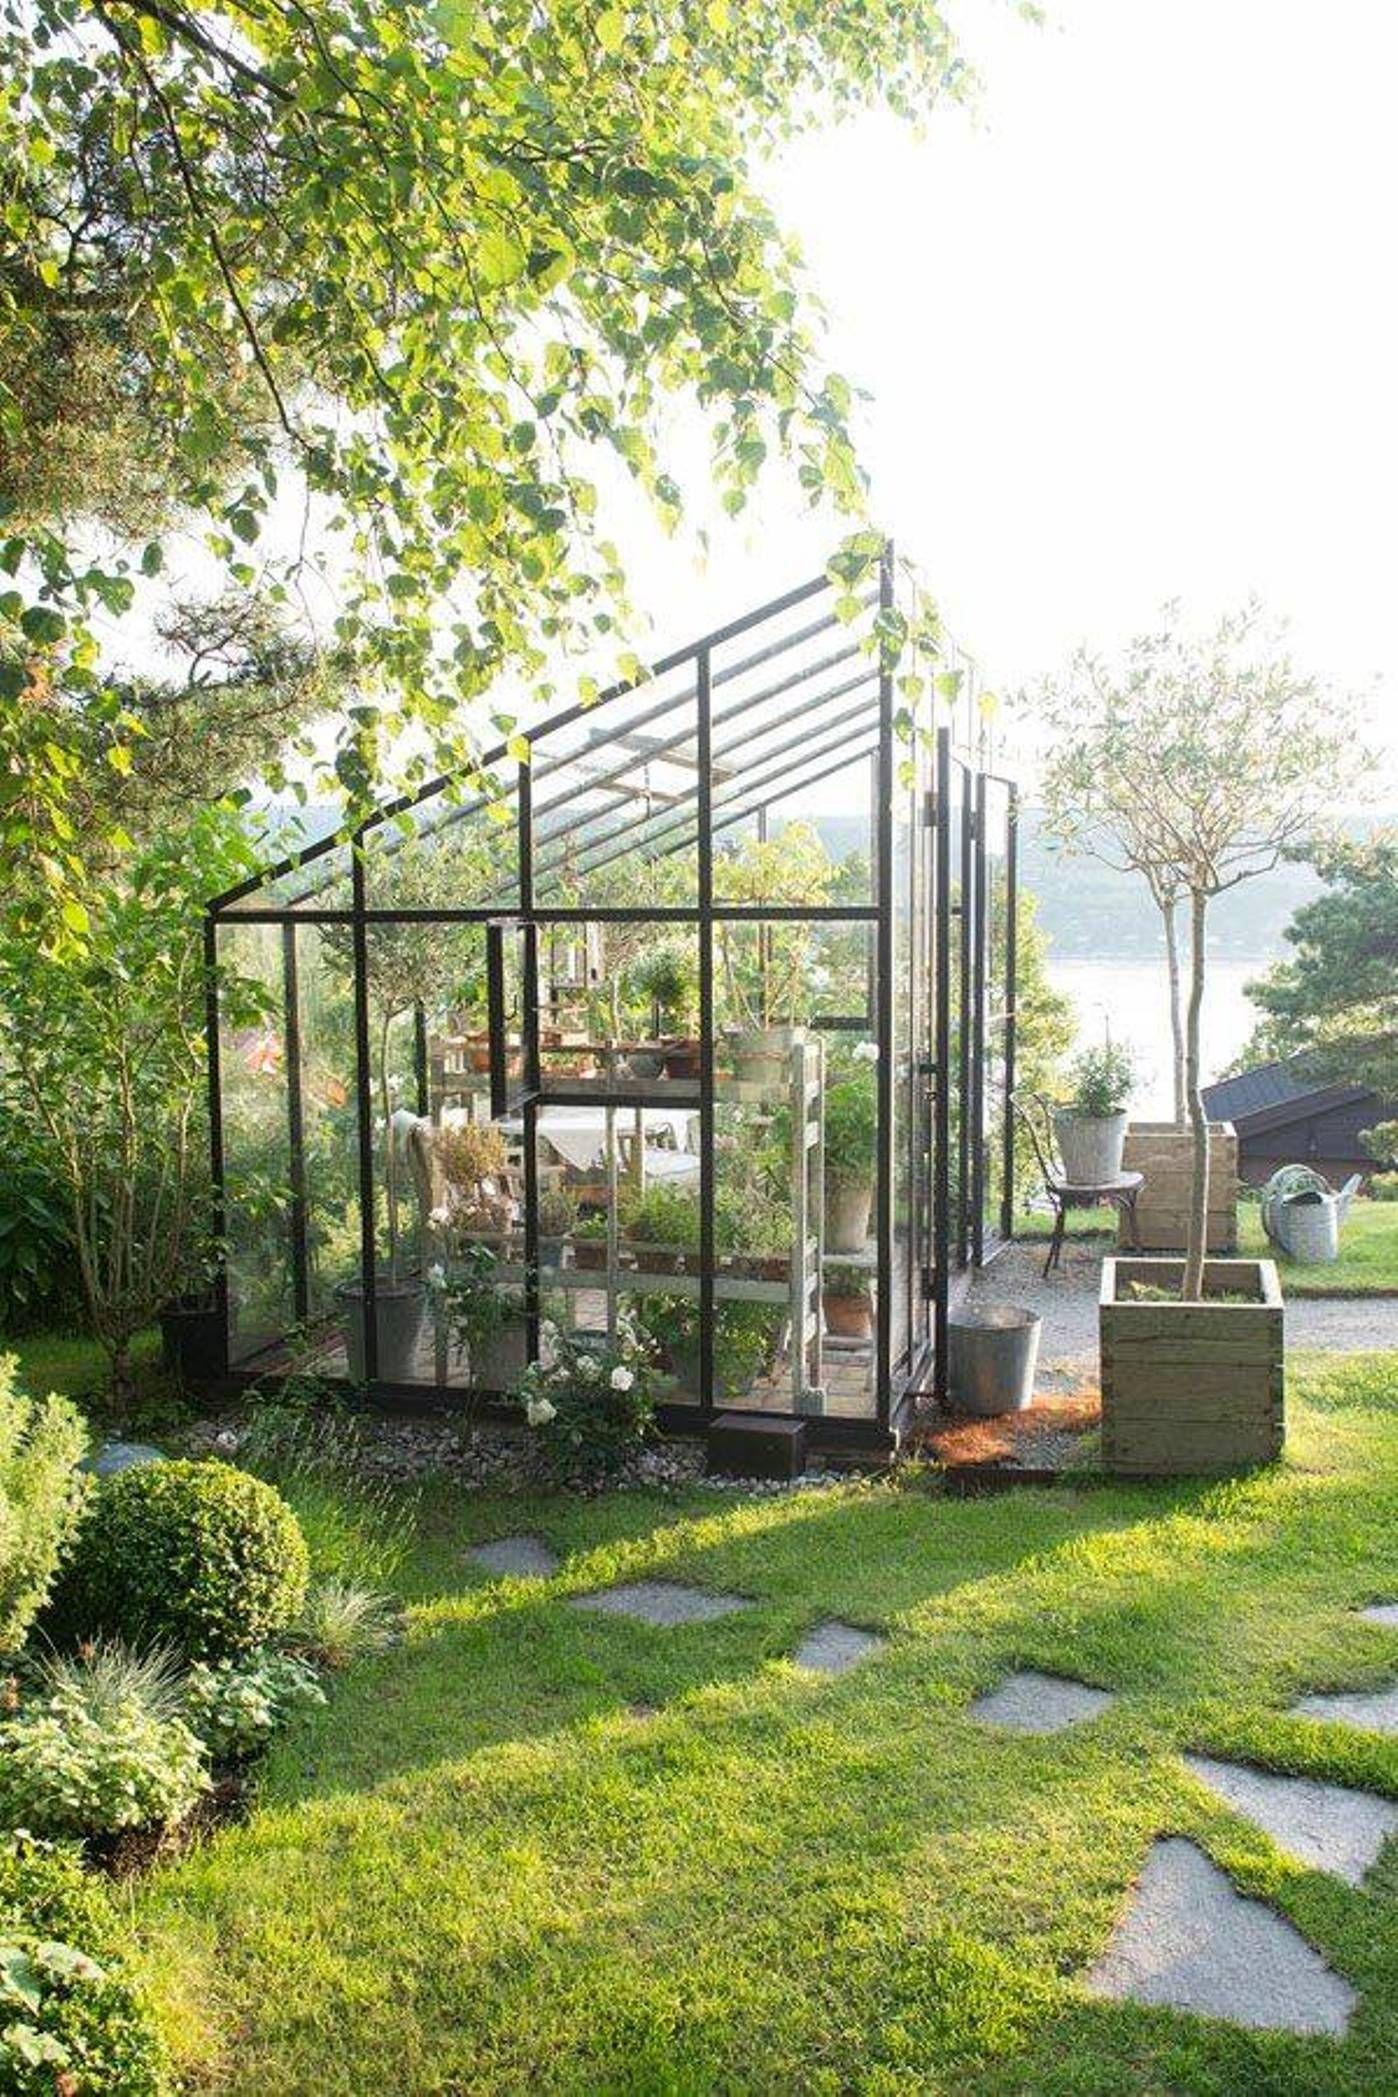 Moderne • Verrière • Jardin D'hiver • Veranda • | Serre ... concernant Verriere Jardin